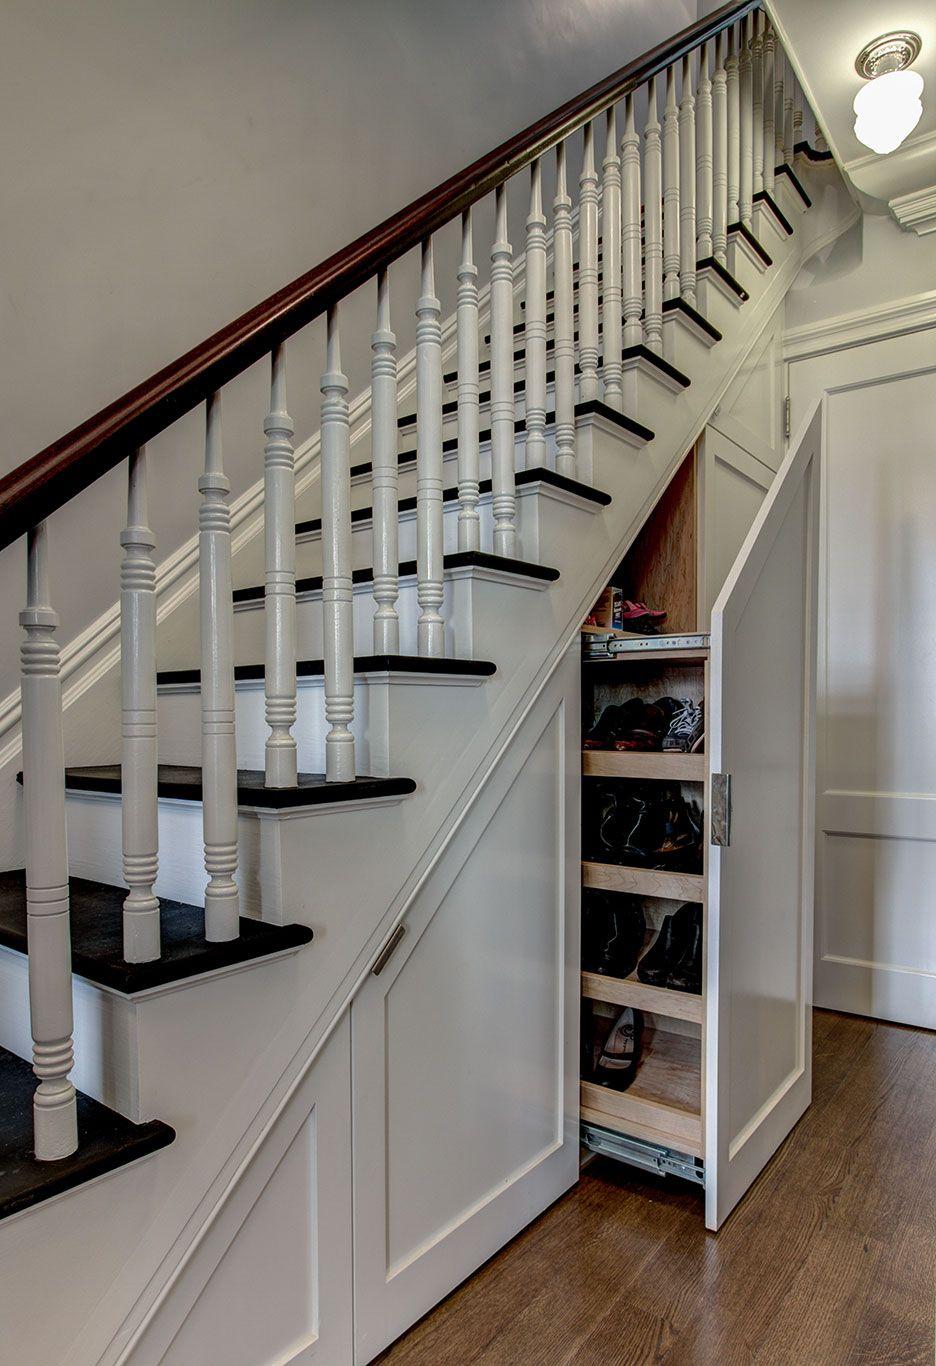 Shoe Storage Under Stairway In Brooklyn Townhouse Renovation Ben